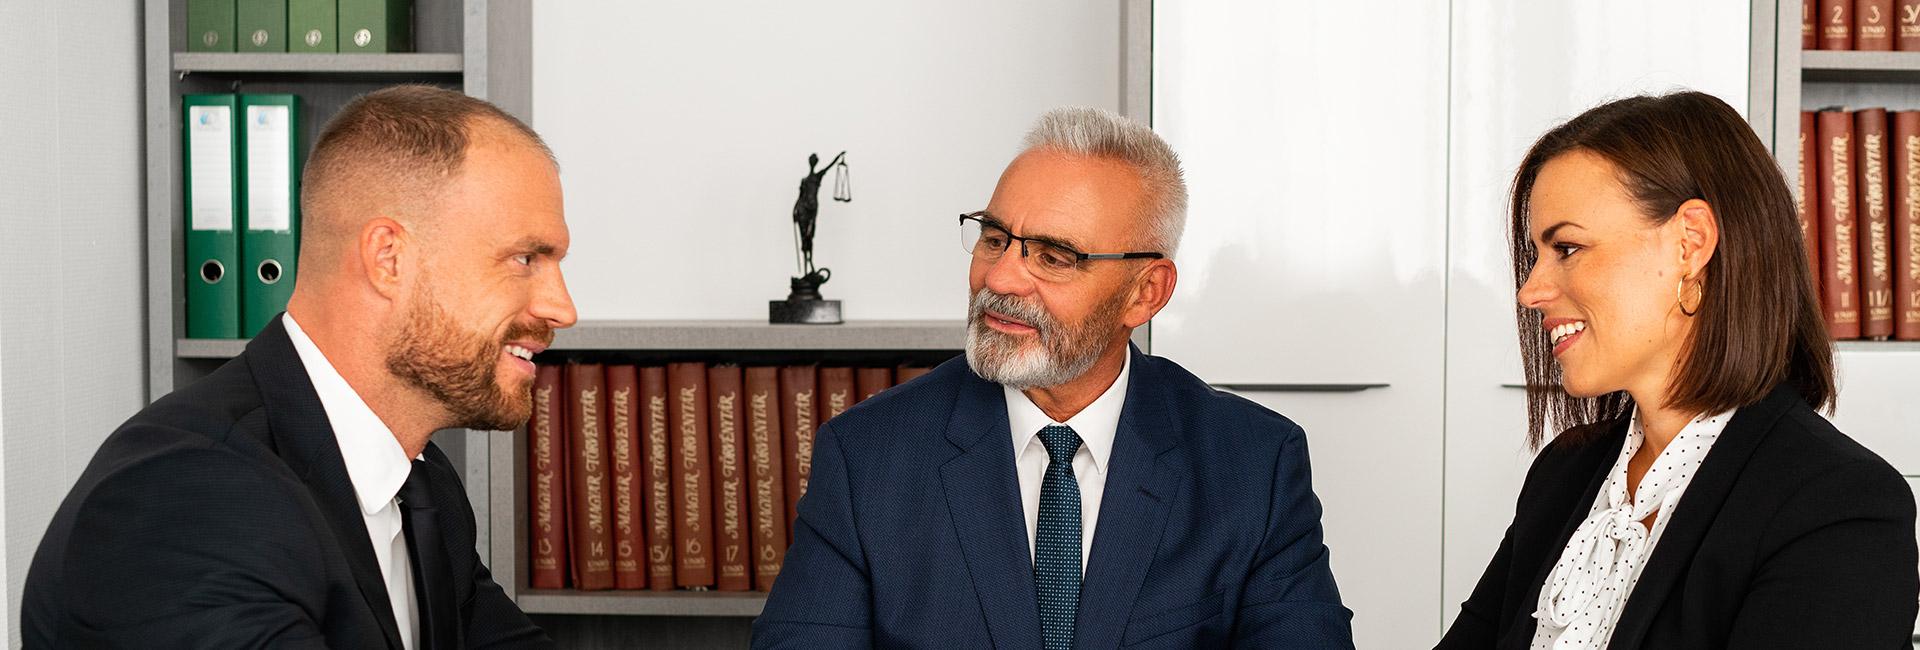 Dr. Mikófalvi ügyvédi iroda